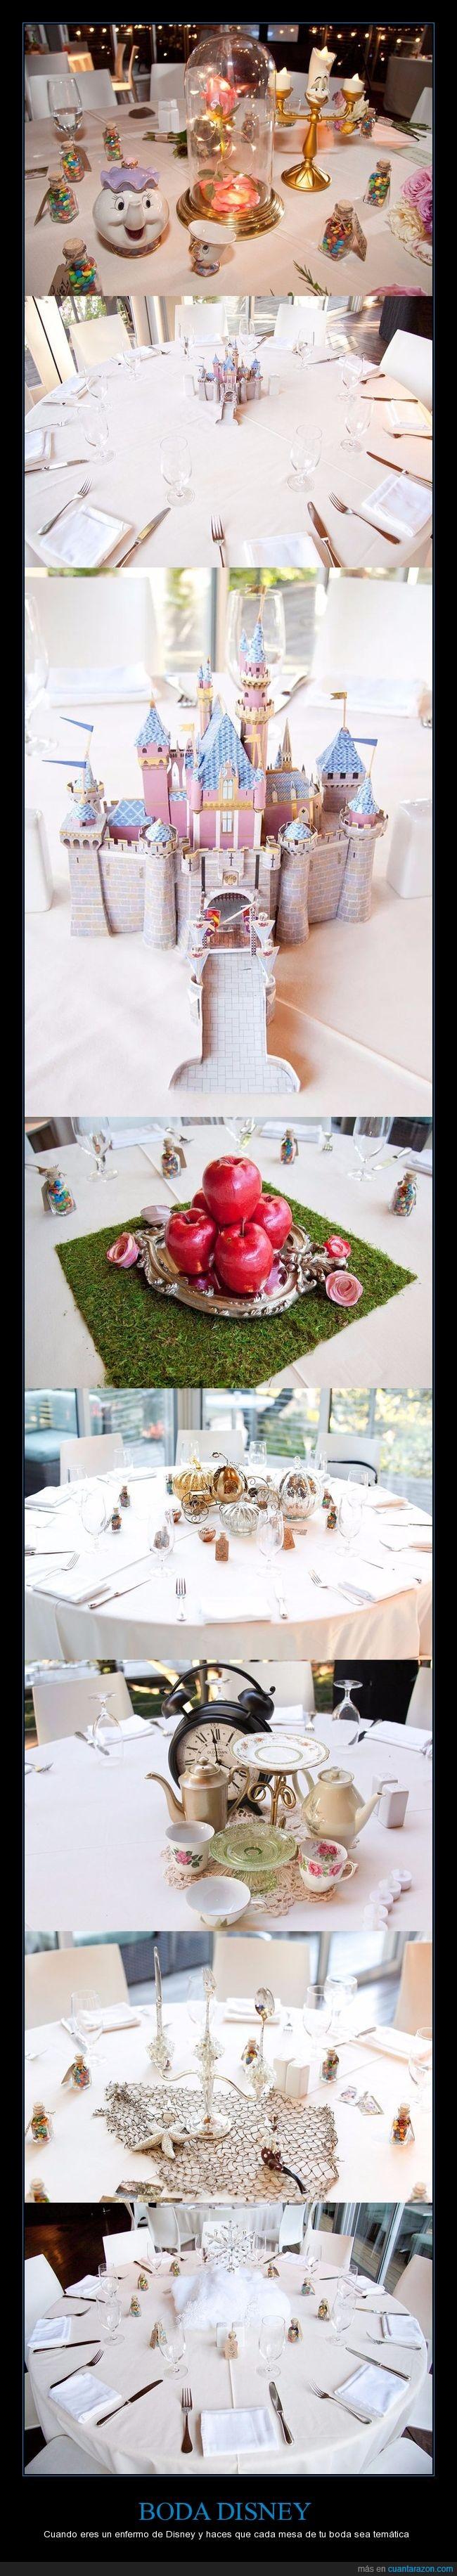 boda,cubiertos,disney,mesas,temática